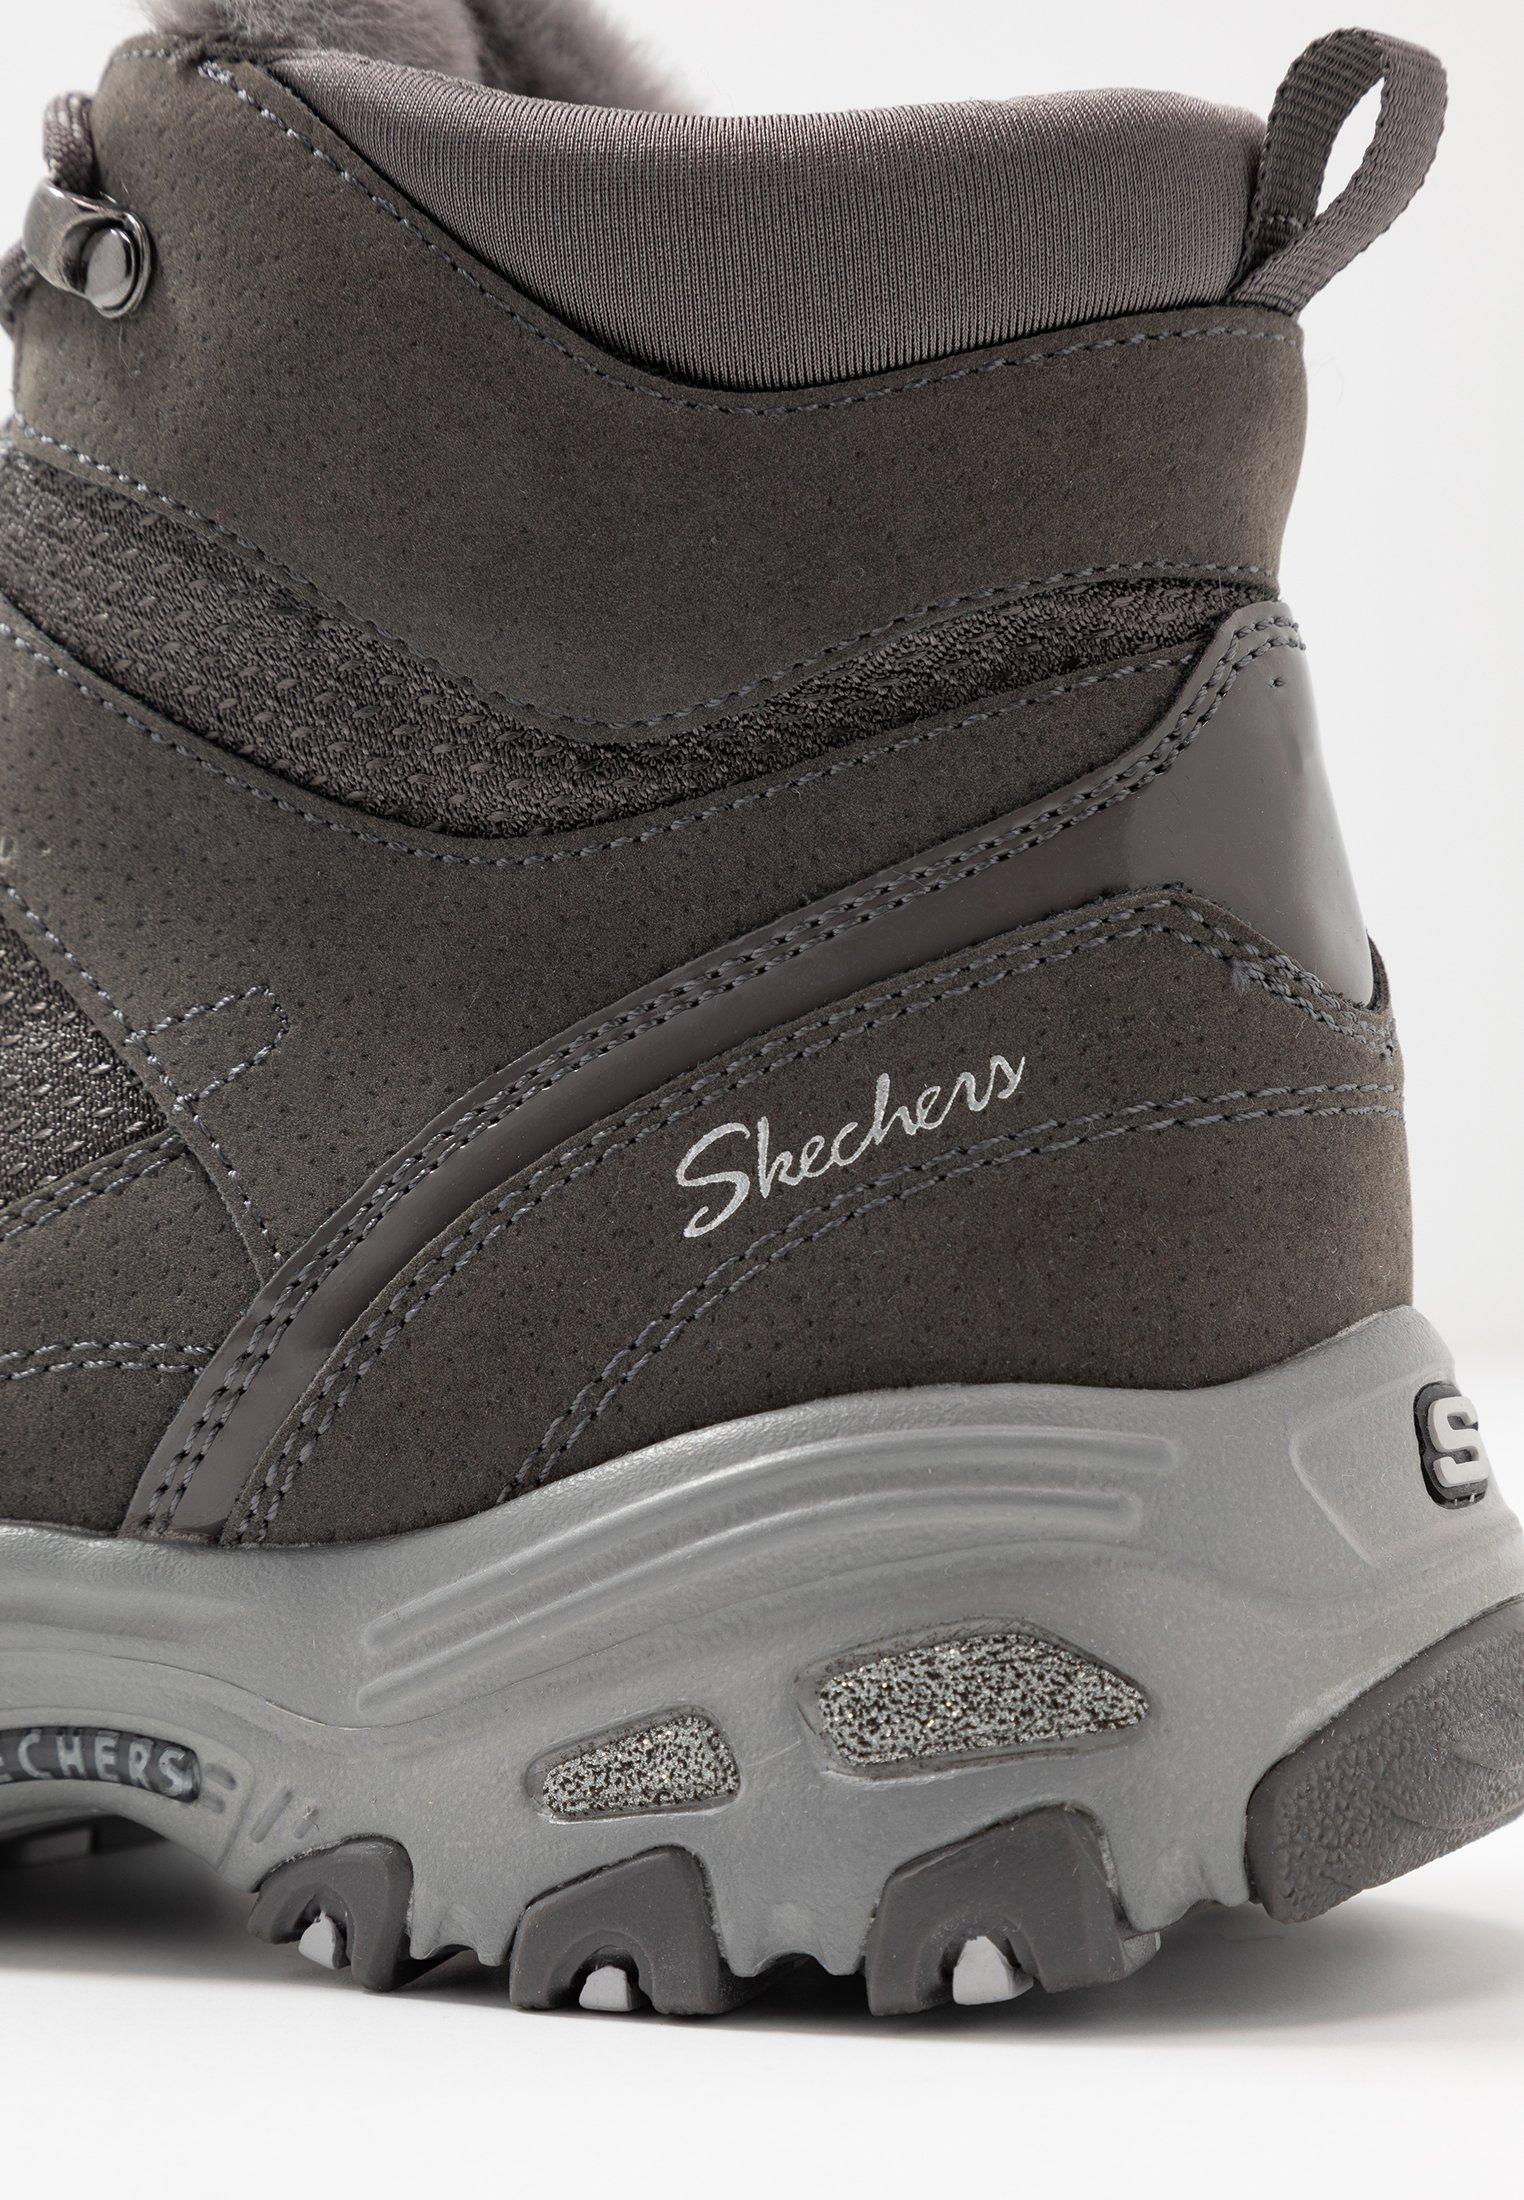 Skechers D'LITES D'LICIOUS Stivaletti stringati charcoal